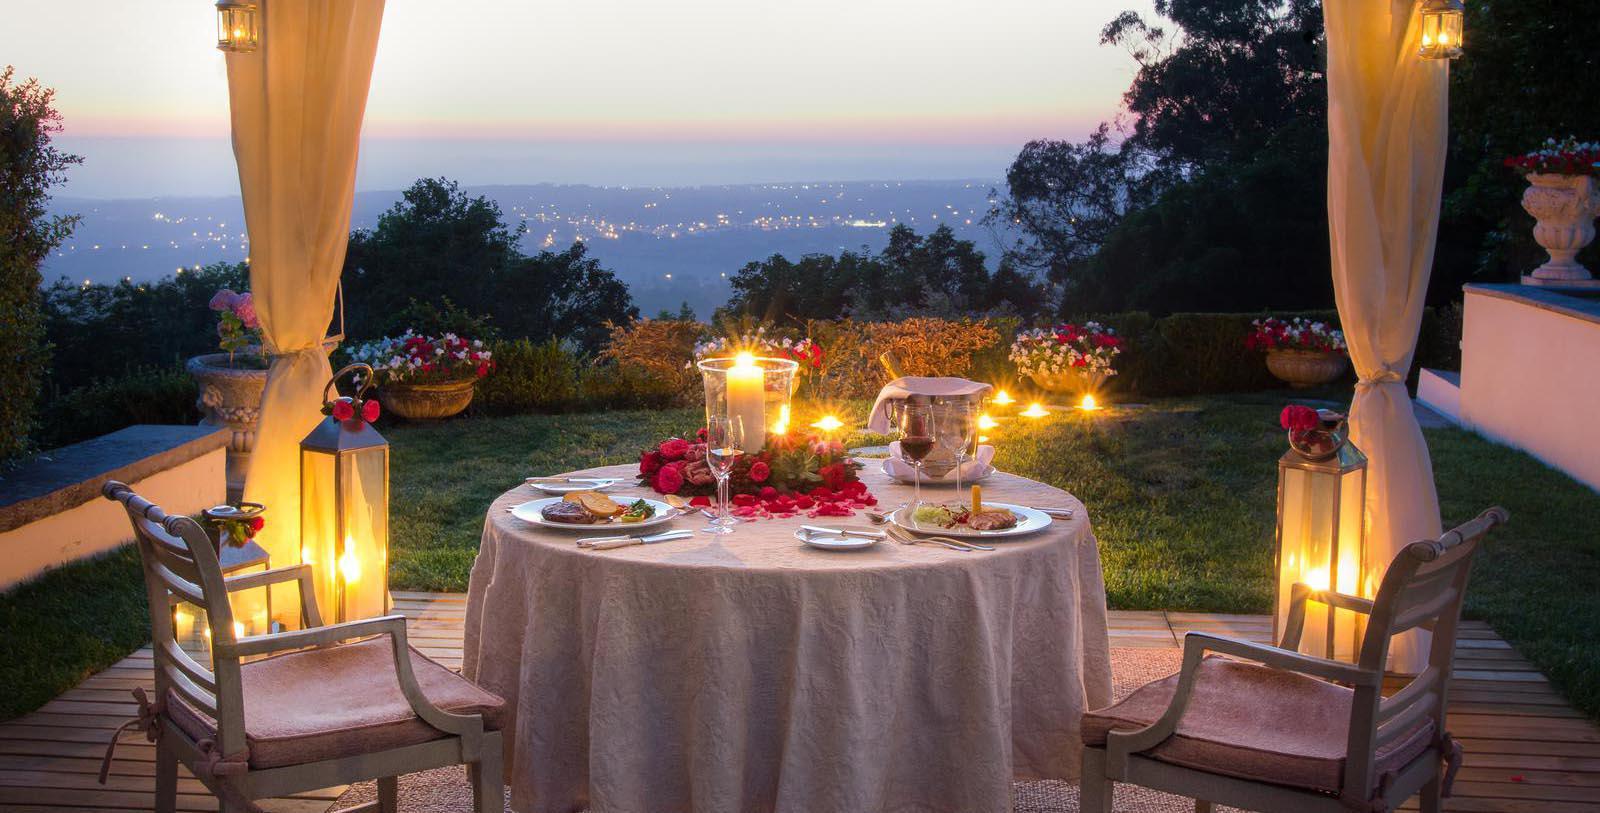 Image of Dining Terrace at Tivoli Palacio de Seteais, 1787, Member of Historic Hotels Worldwide, in Sintra, Portugal, Hot Deals